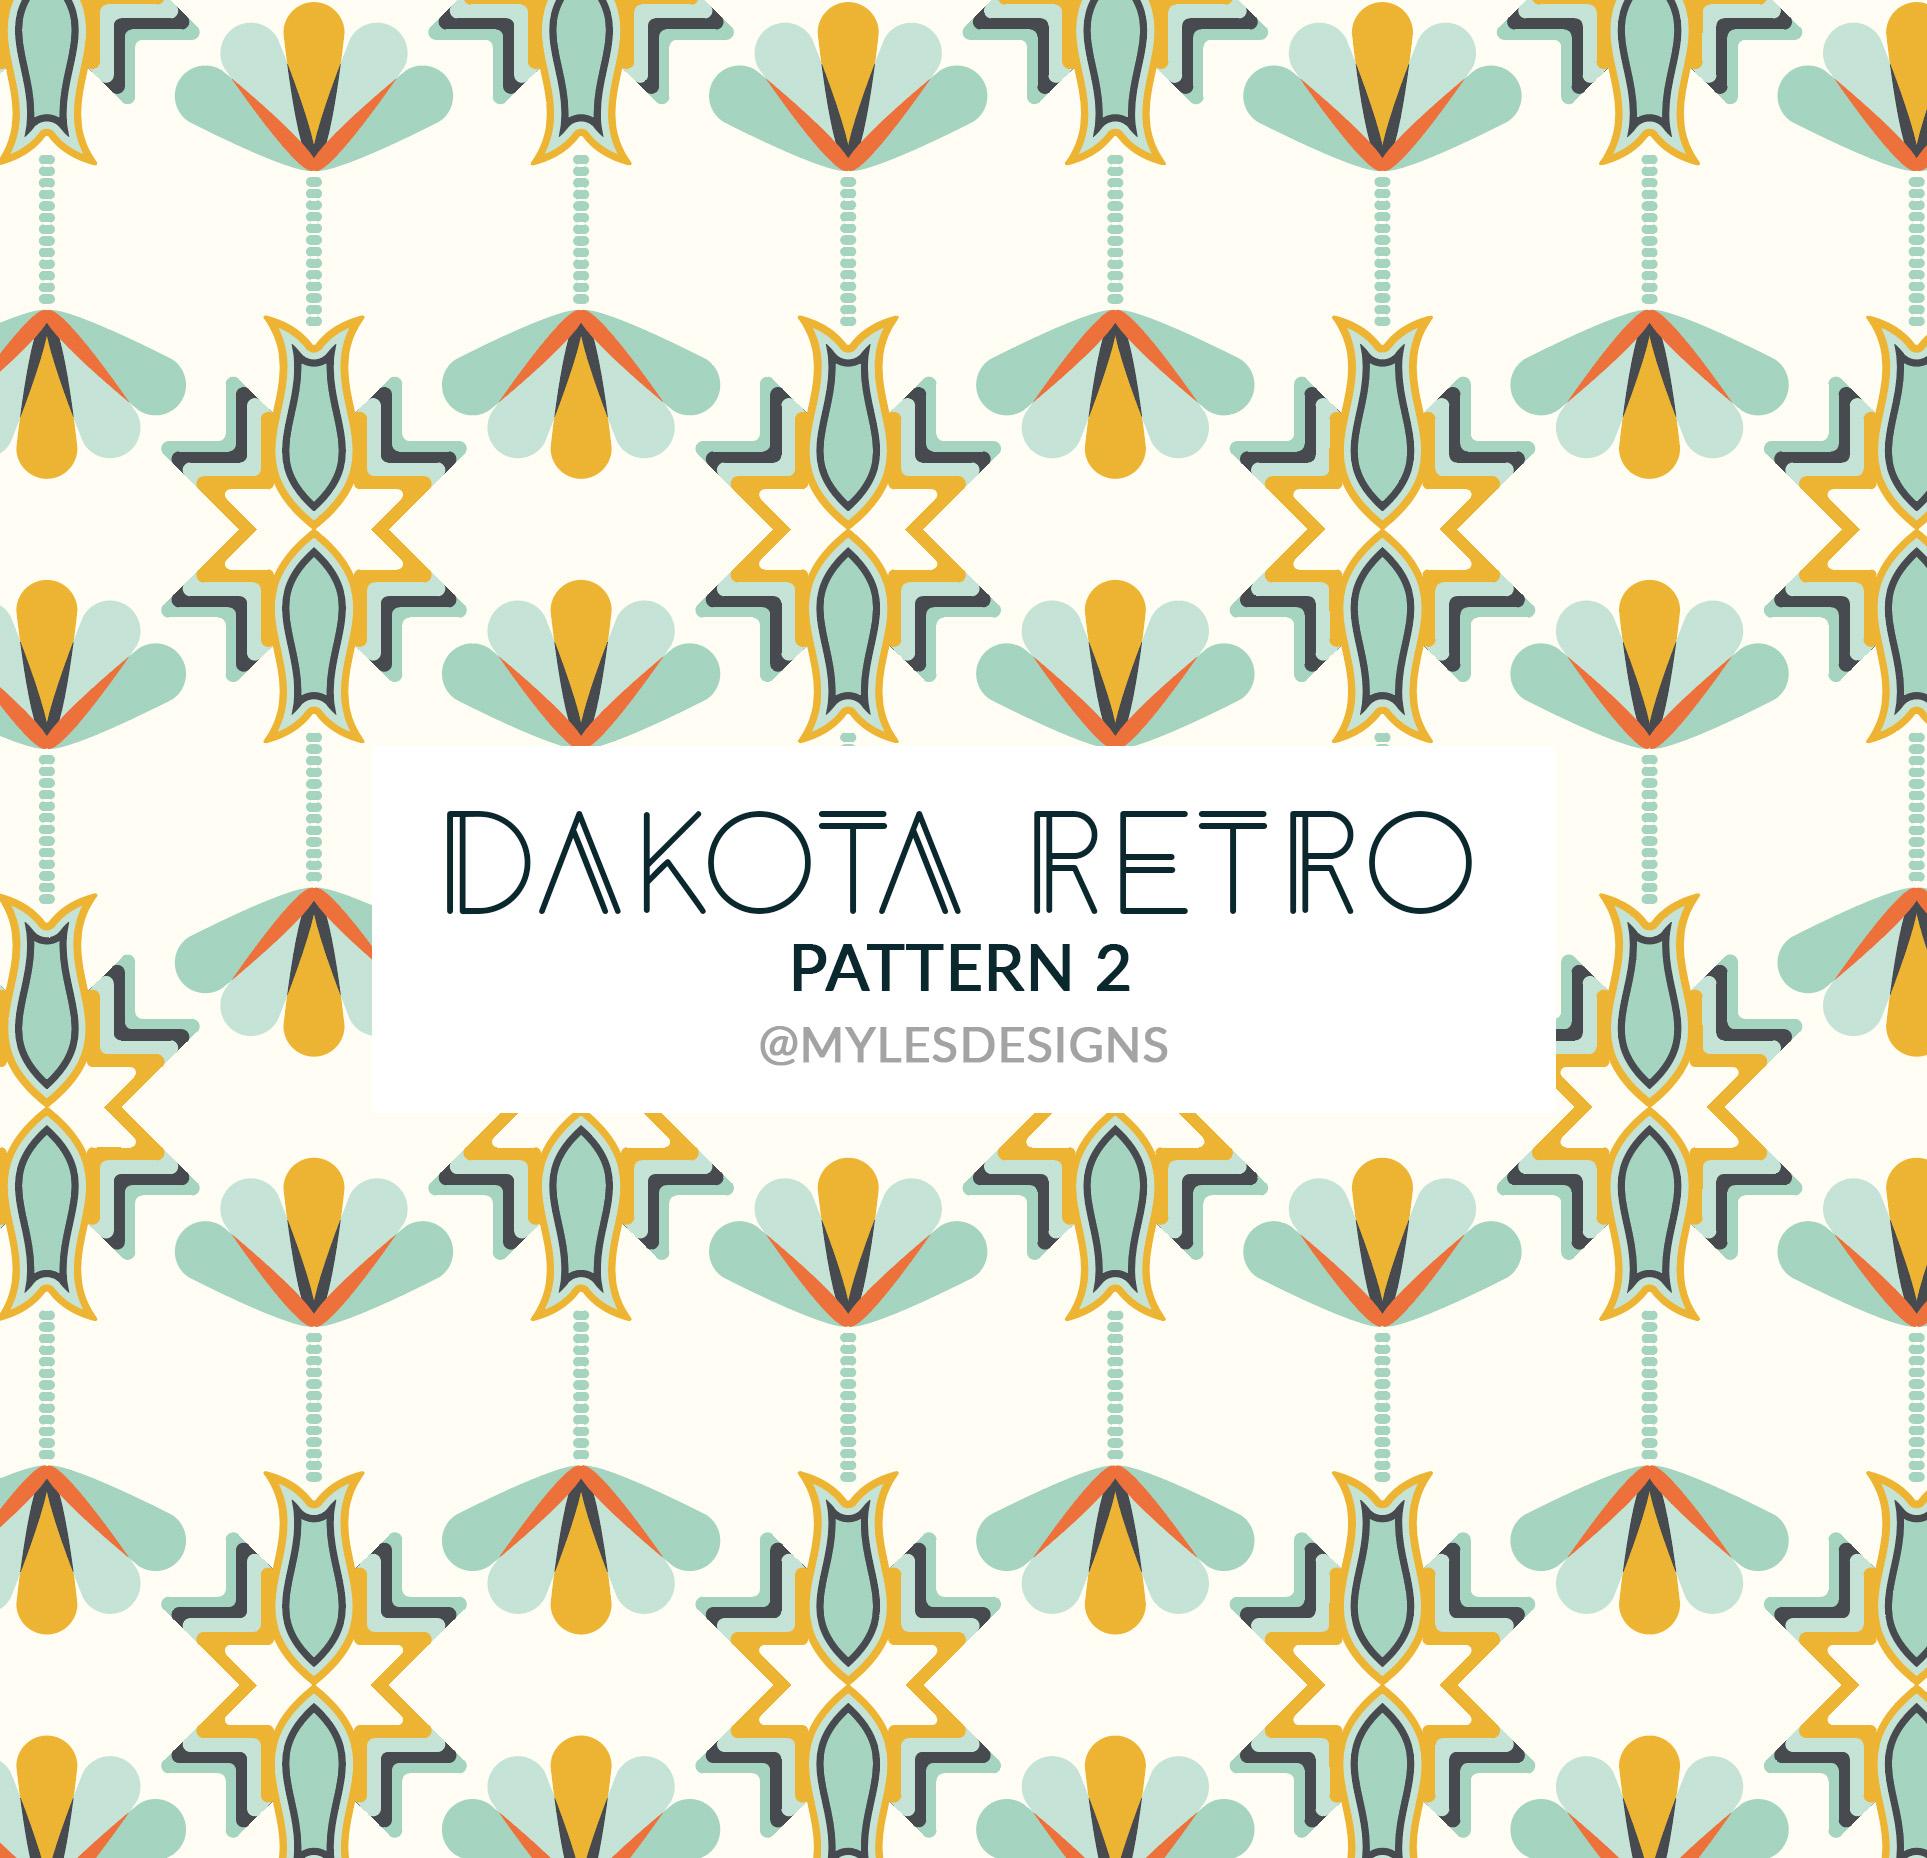 Dakota Retro - Fabric Pattern 2 | Marlena Myles